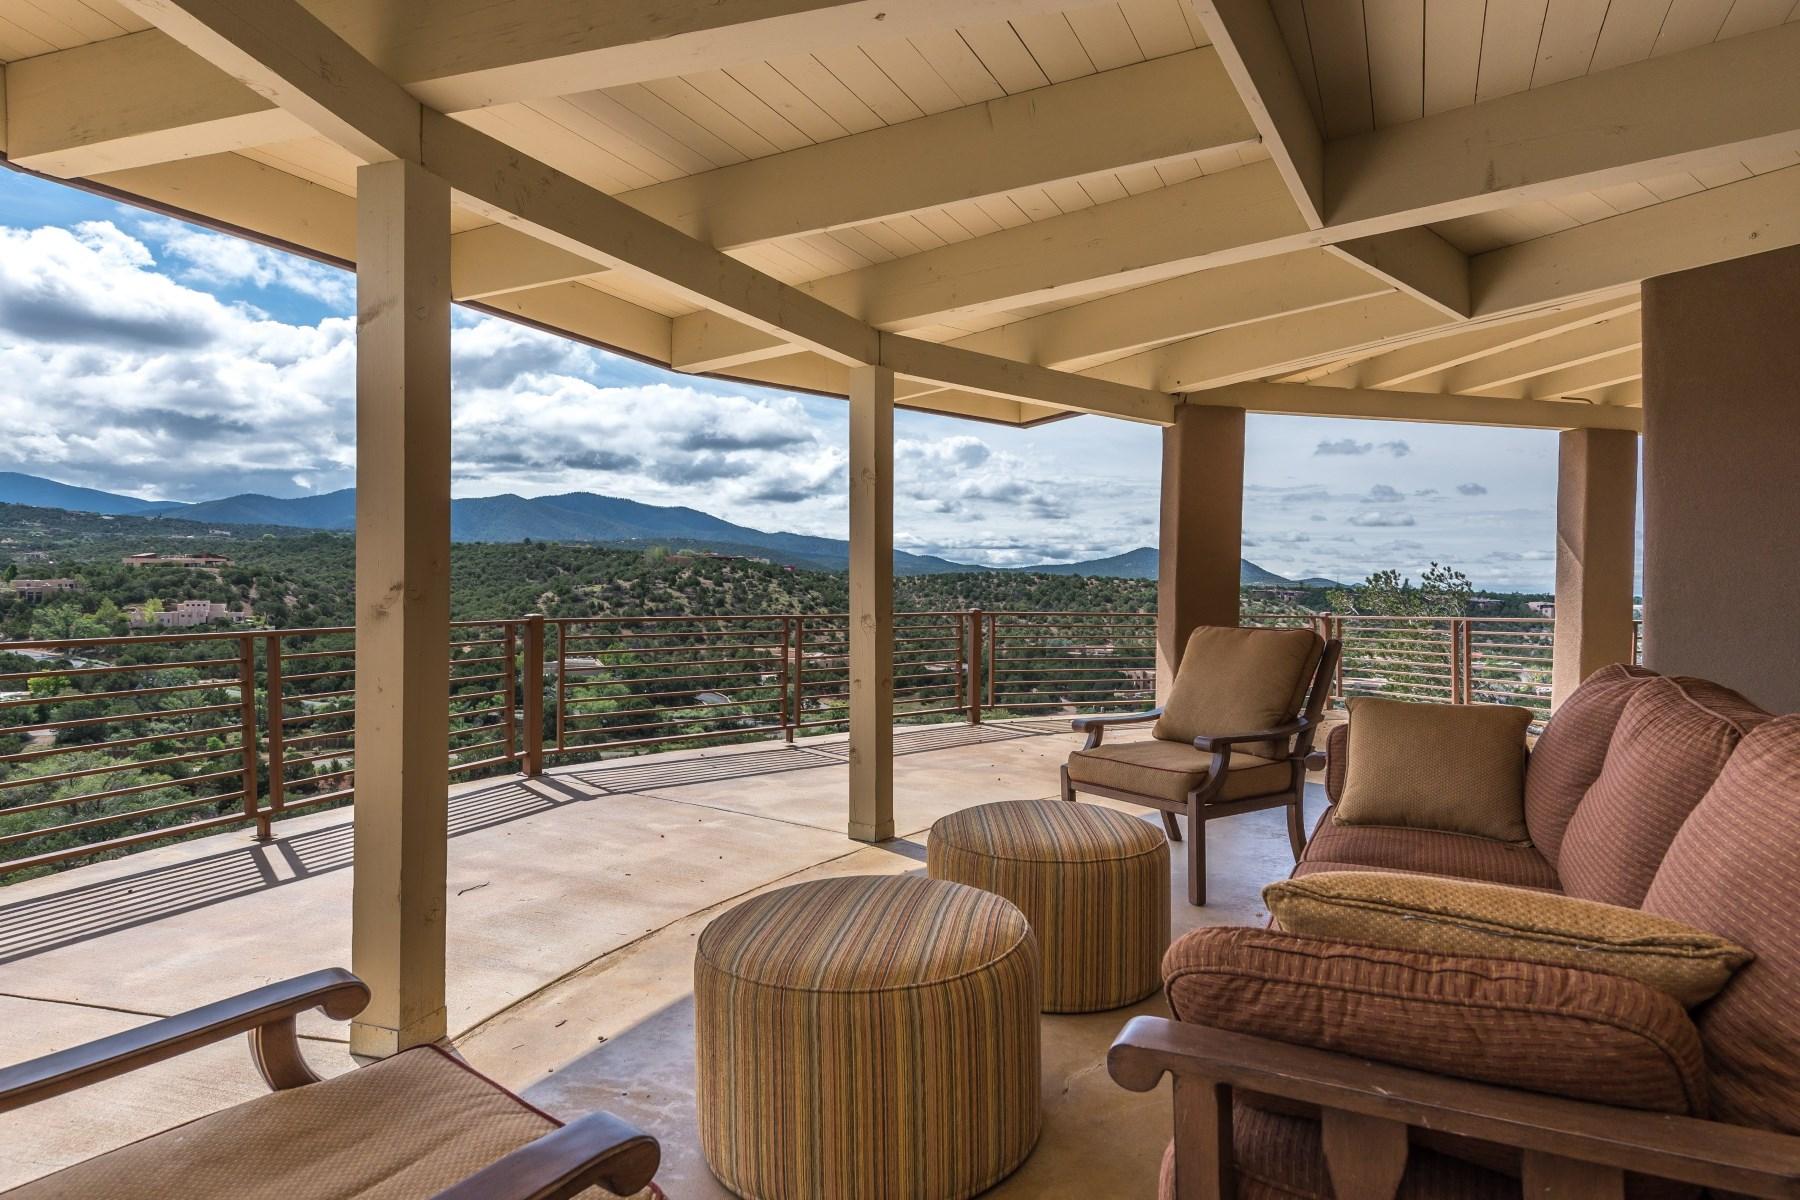 Single Family Home for Sale at 1000 Hillcrest Santa Fe City Northeast, Santa Fe, New Mexico 87501 United States